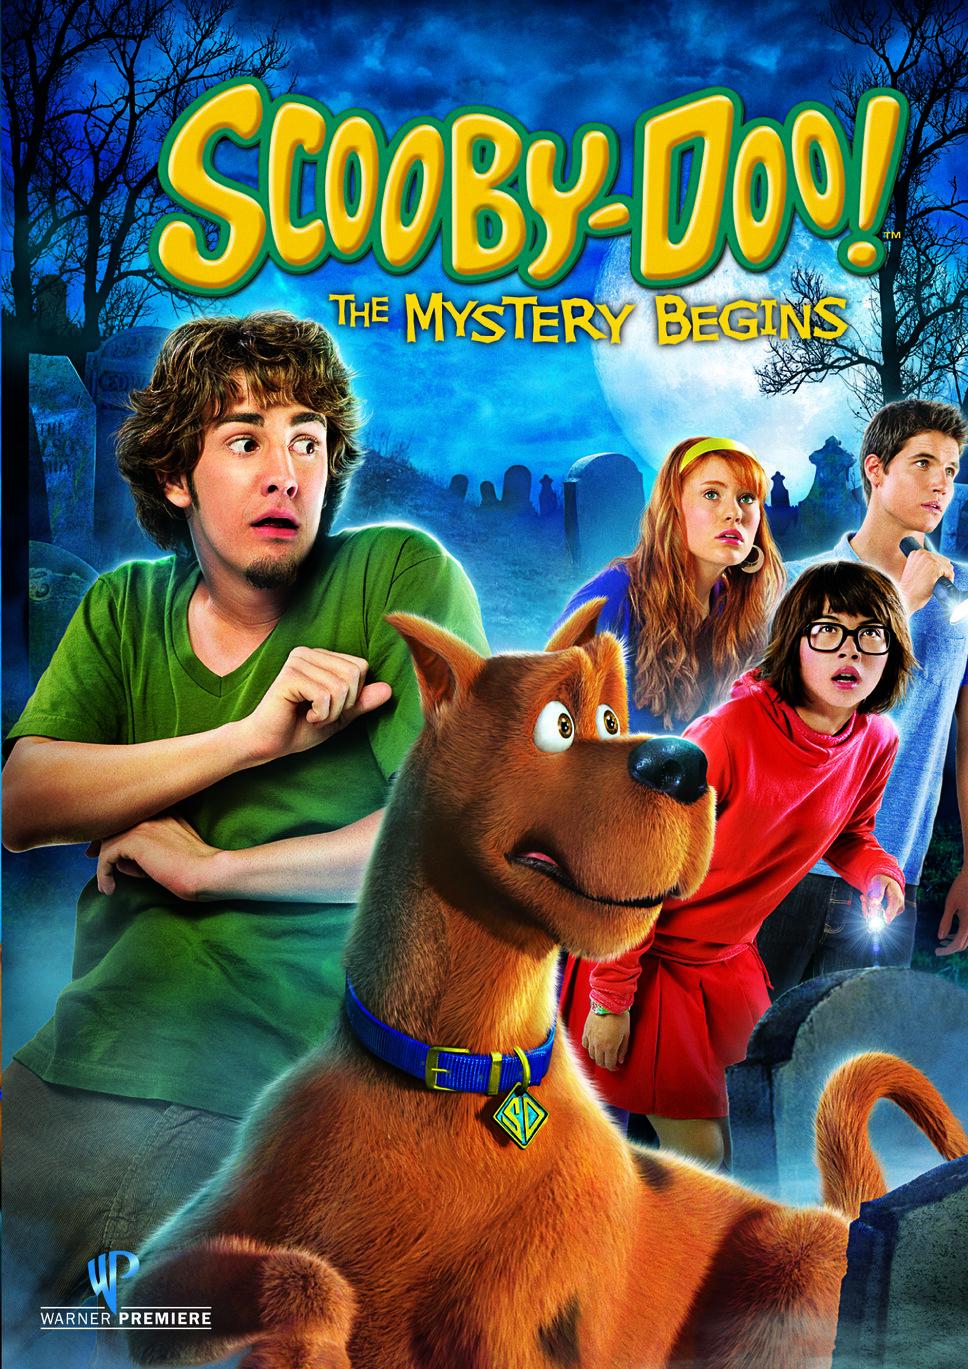 Watch scooby doo the movie online